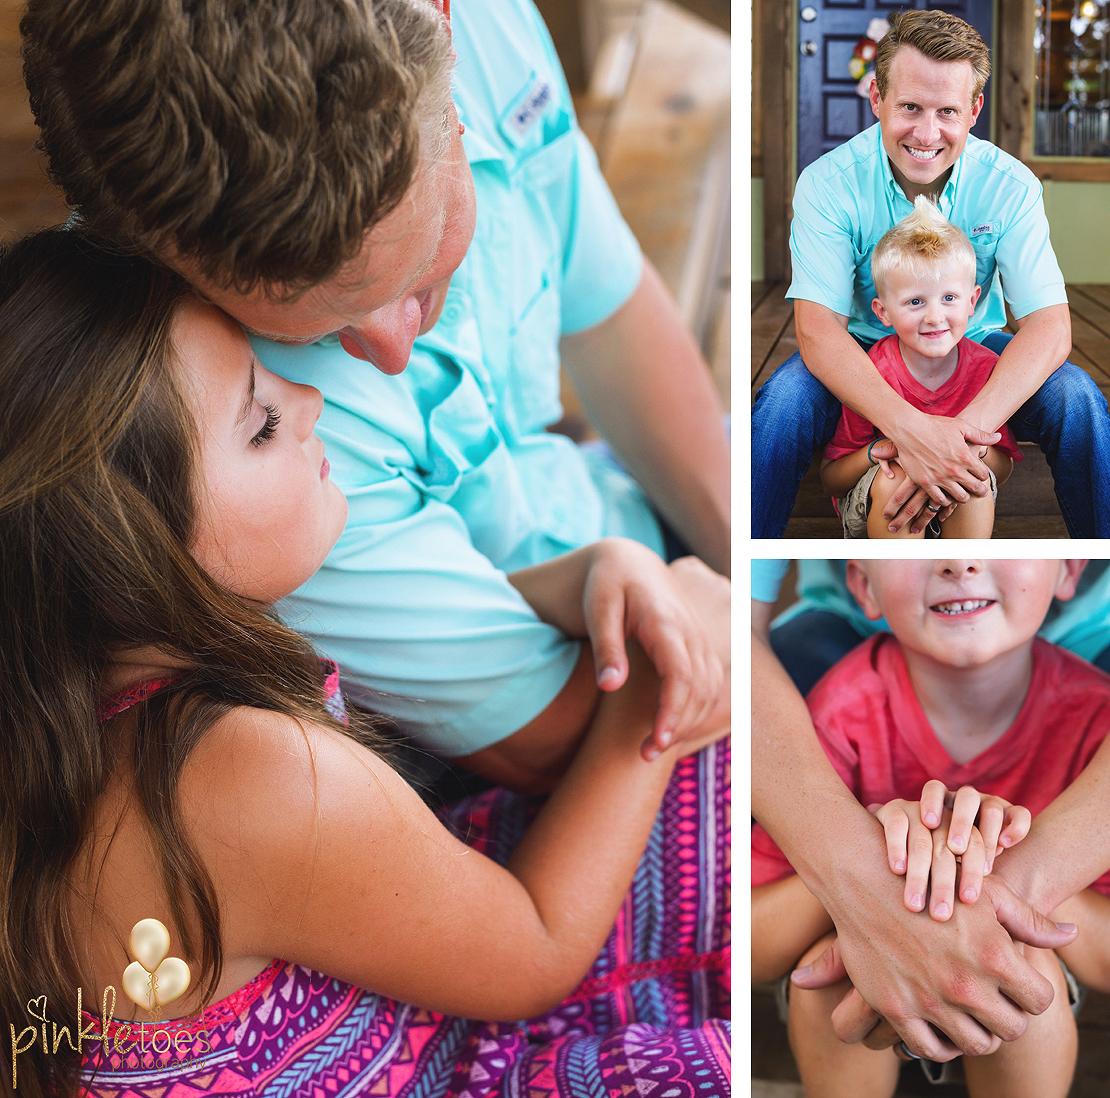 austin-wimberley-lifestyle-family-photographer-020